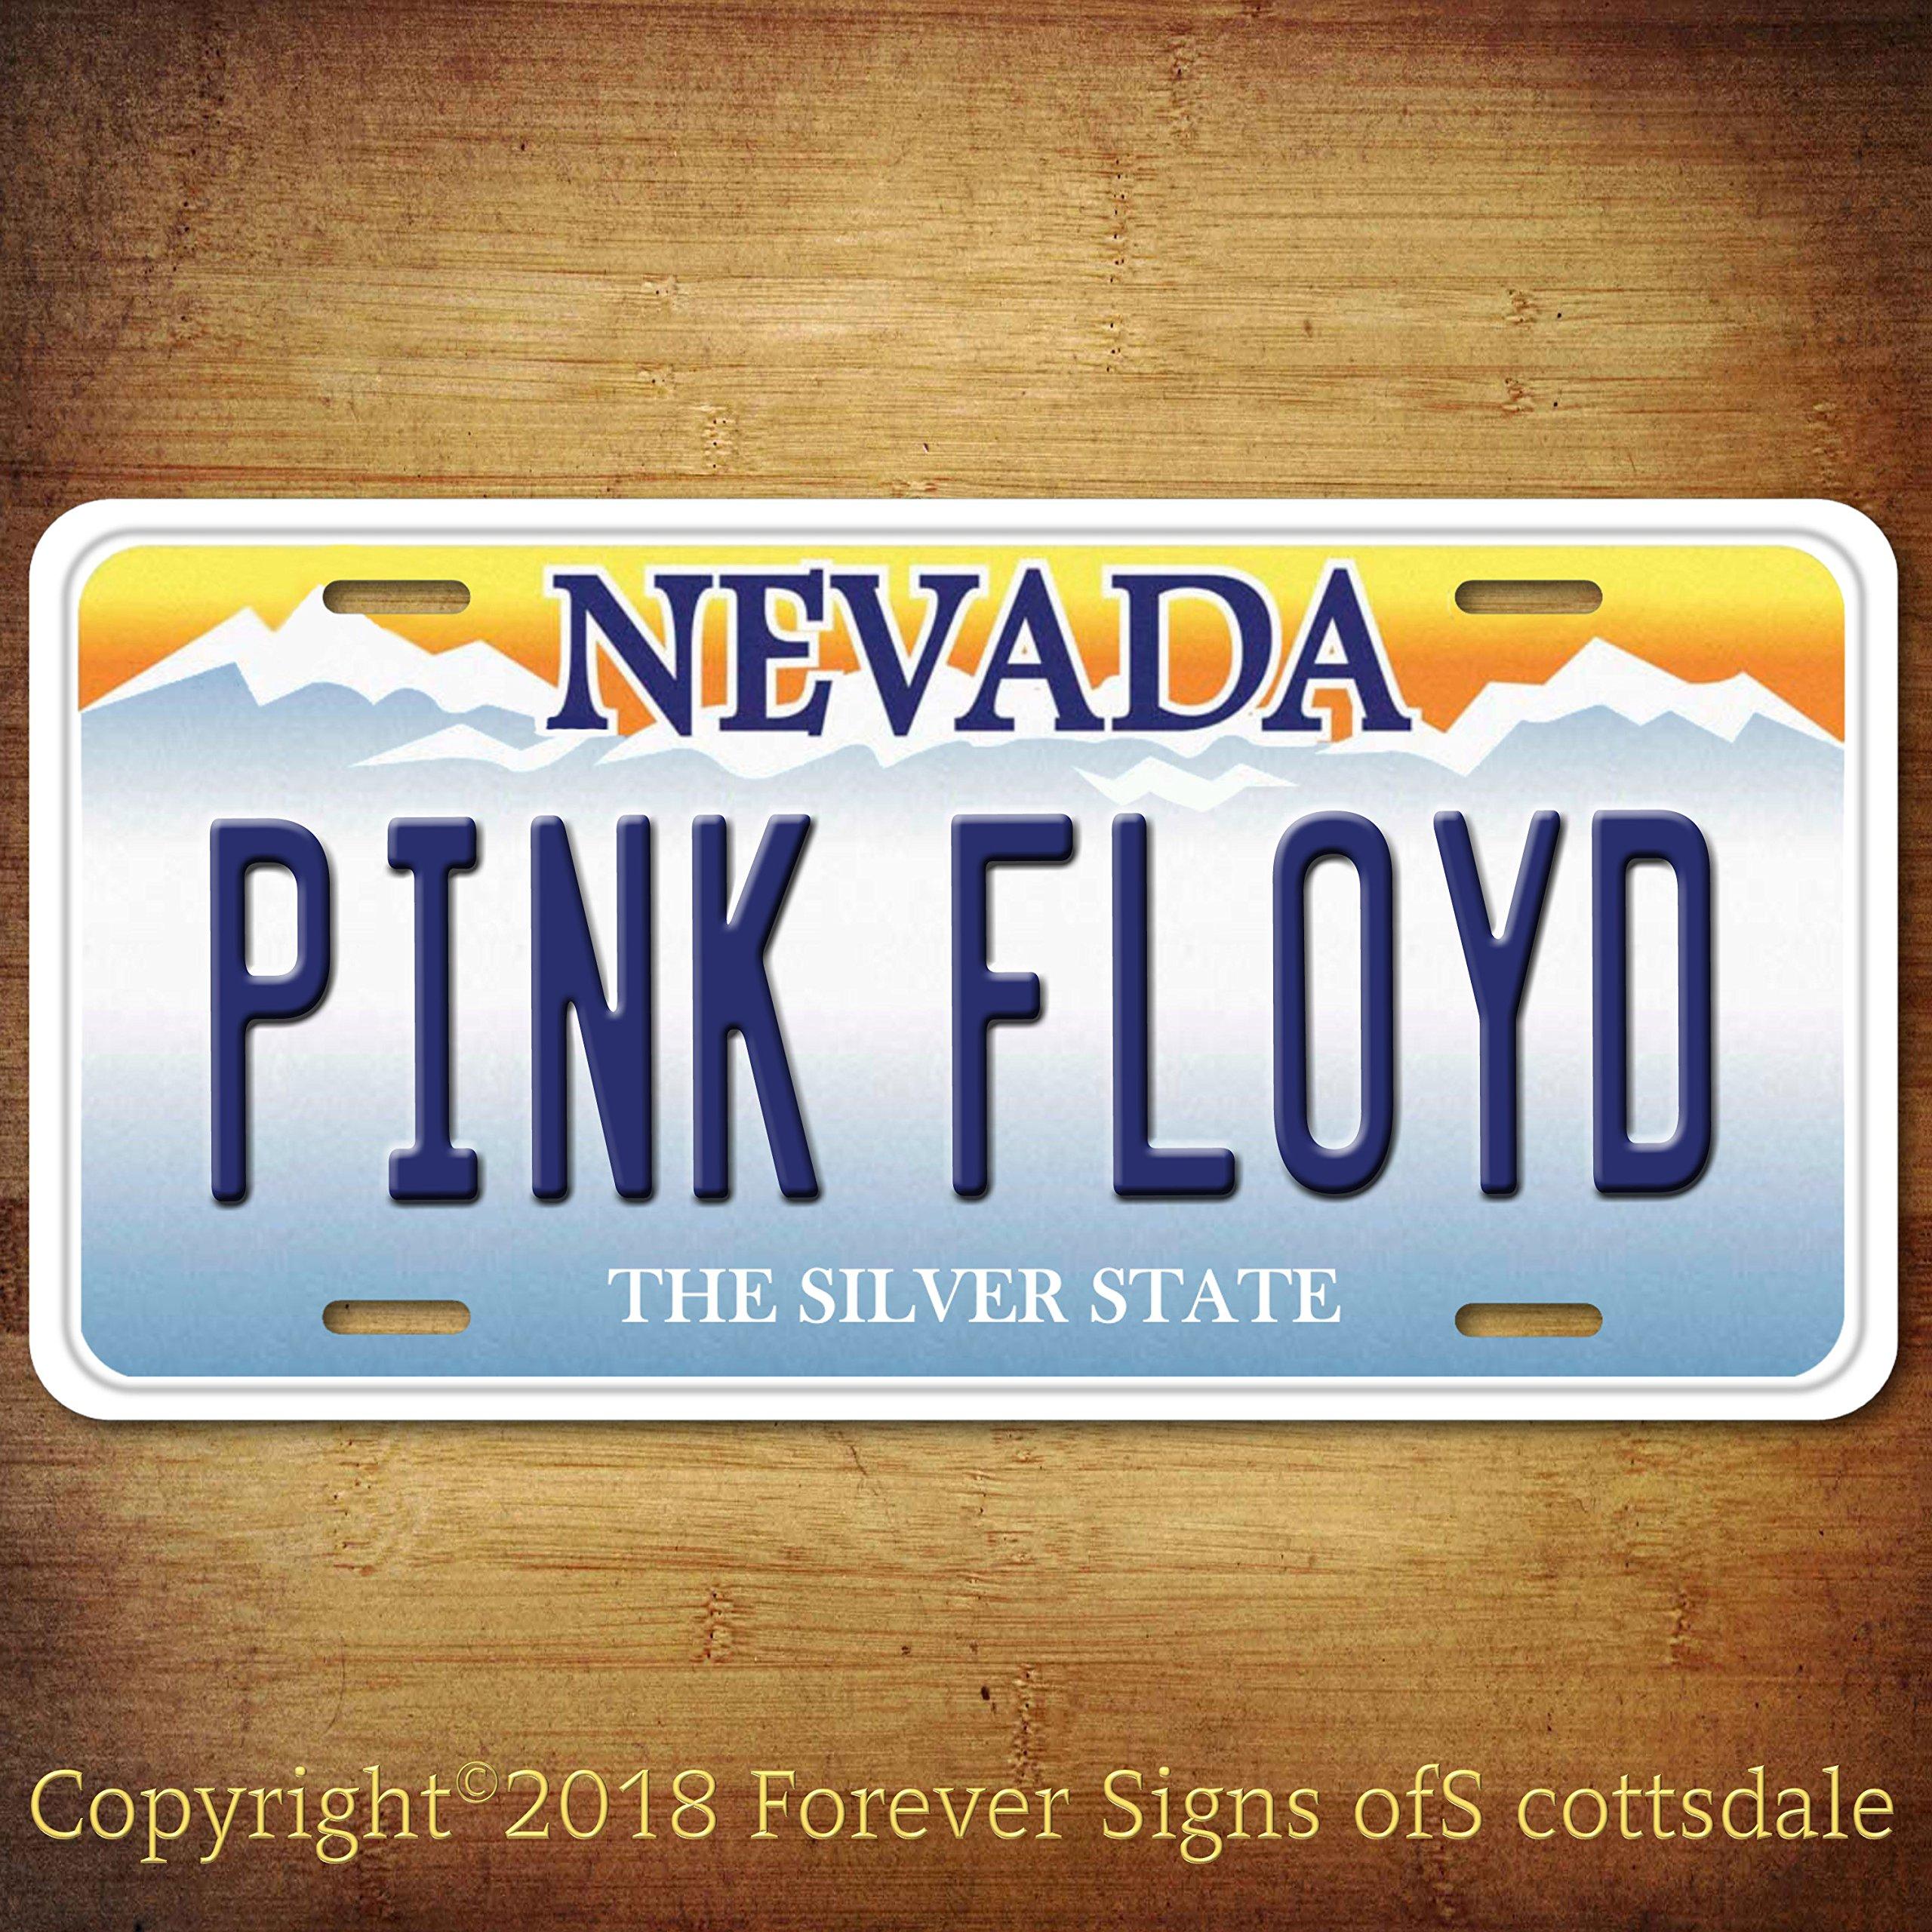 Pink Floyd Rock Band Nevada Aluminum Vanity License Plate Tag